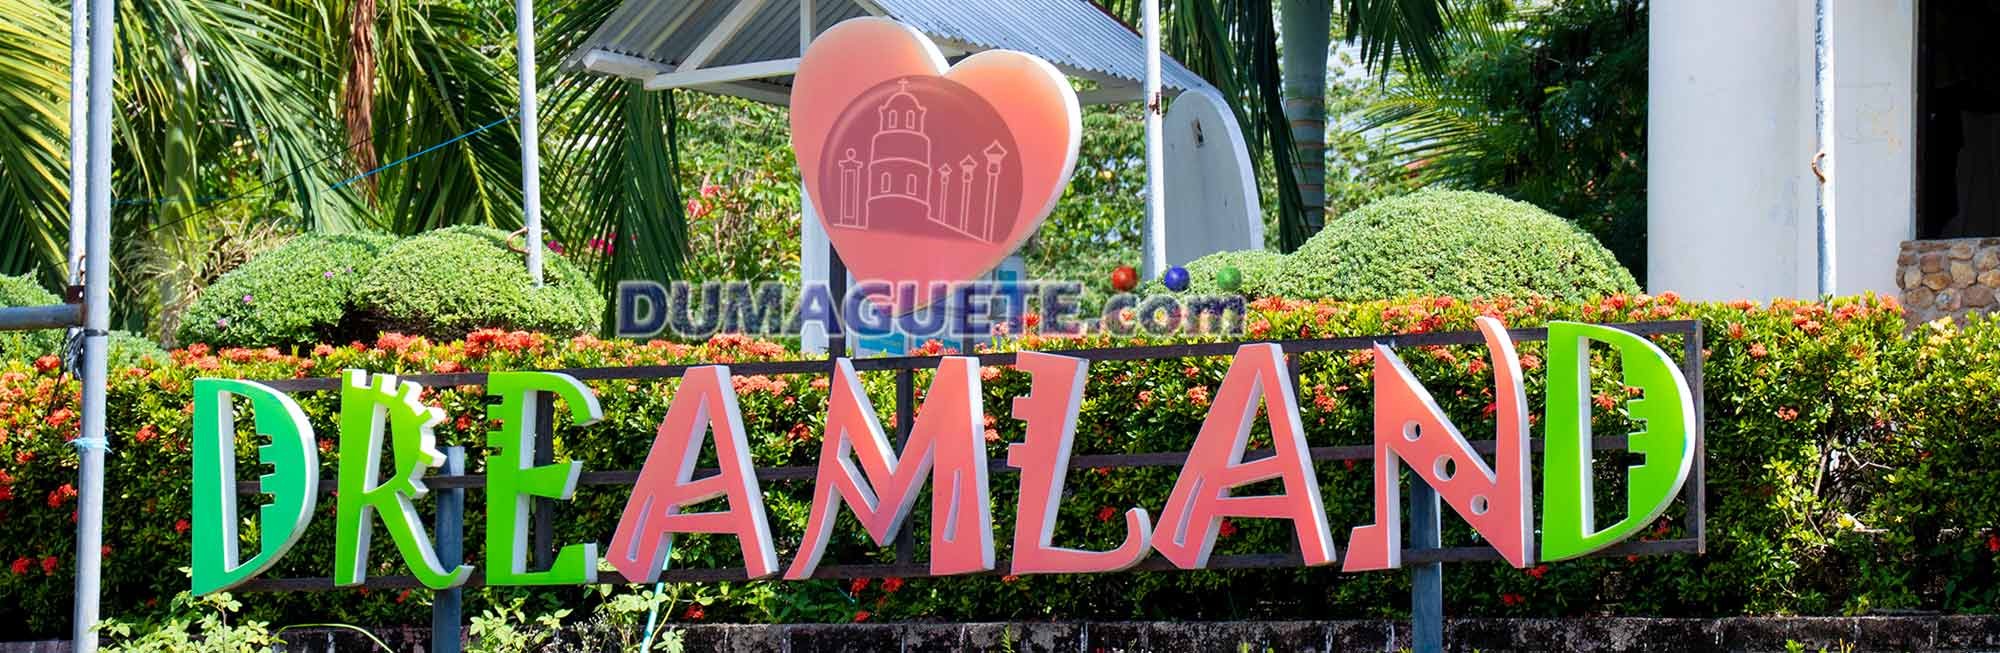 Amlan - Negros Orinetal - Dreamlad Sign